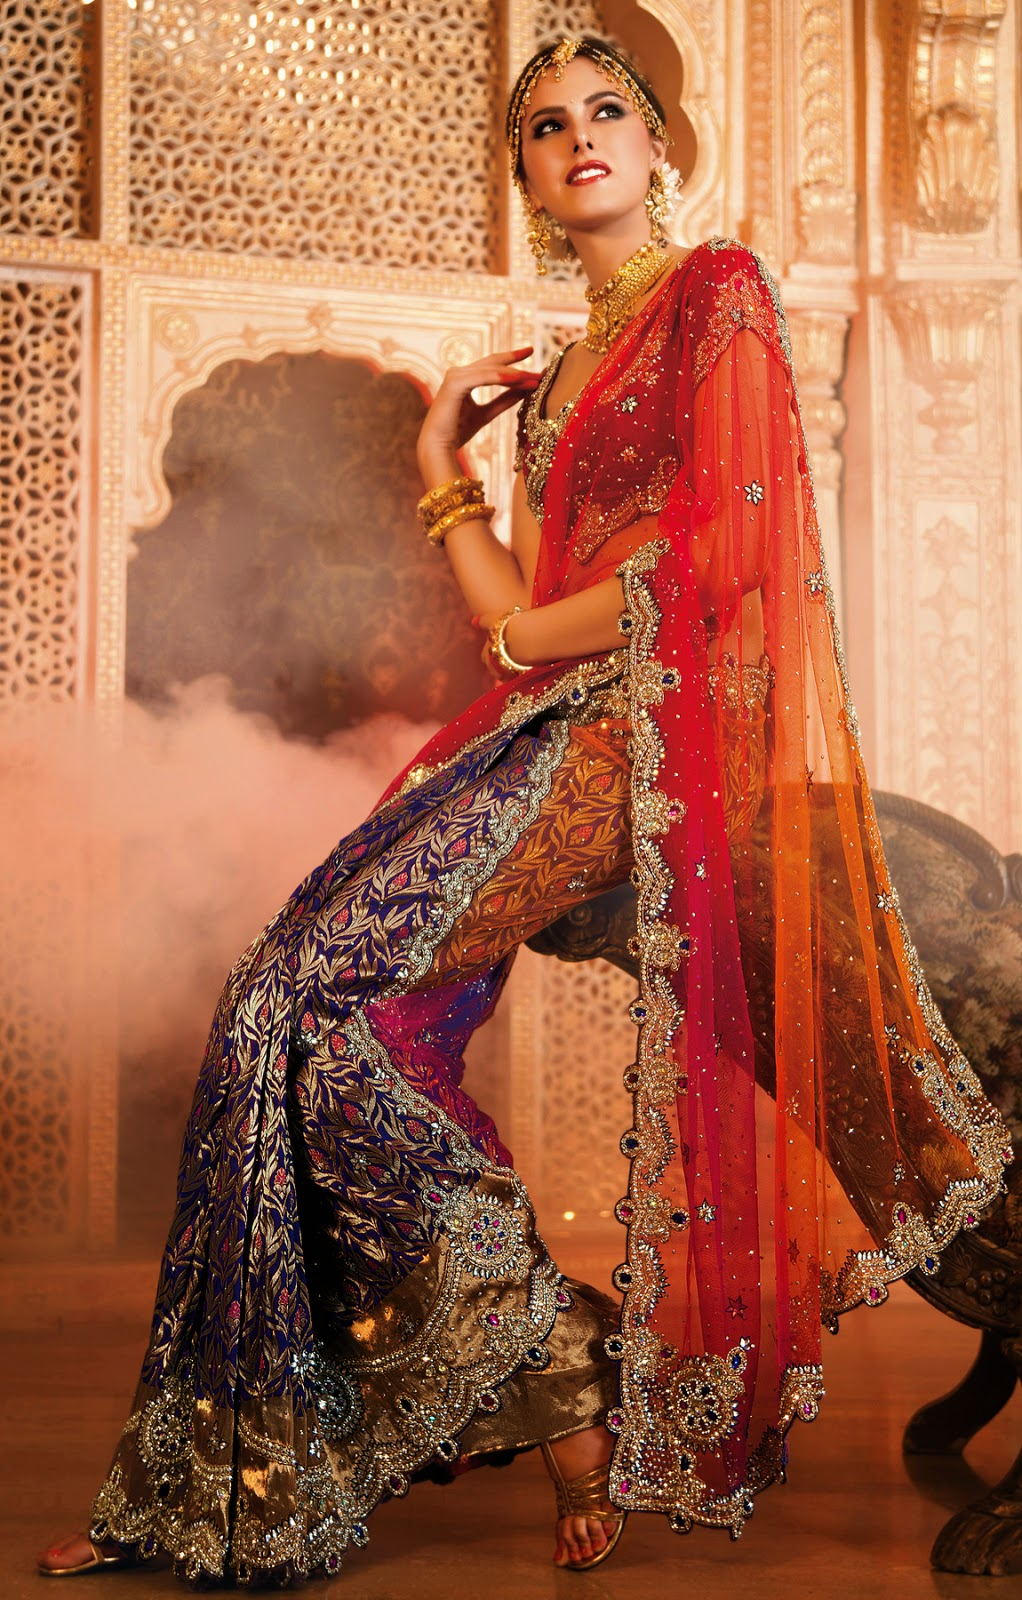 Buy Sarees Online: Best Sarees Of India In 2014